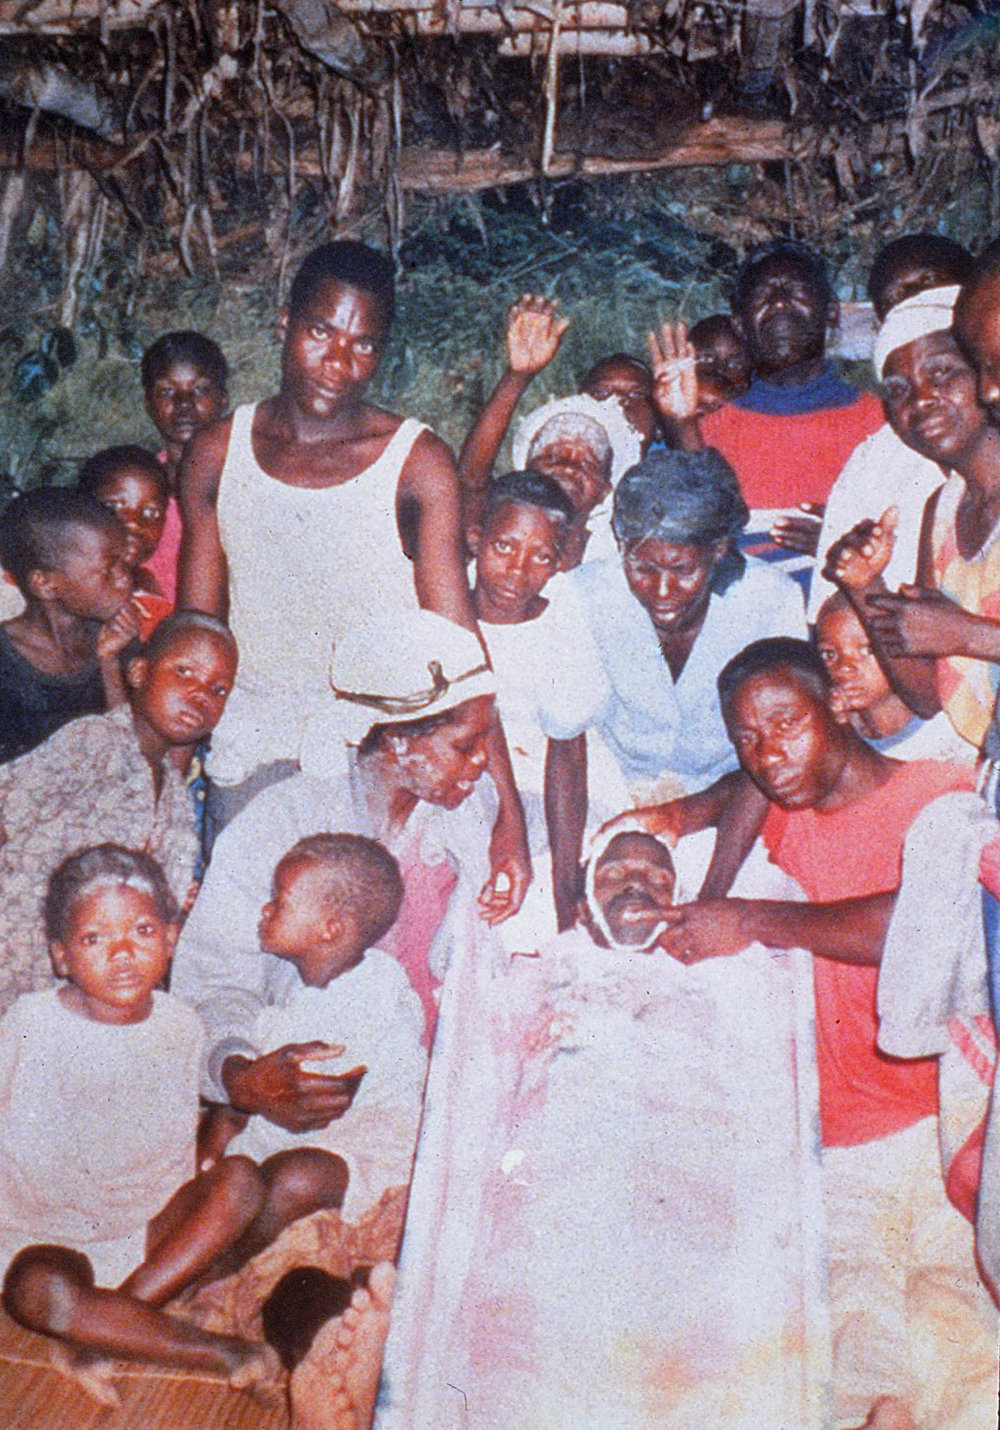 Menga-Family-at-Gaspars-funeral--Ebola--Garrett-(deleted-4db44ddc-8b0497-0872a368).jpg